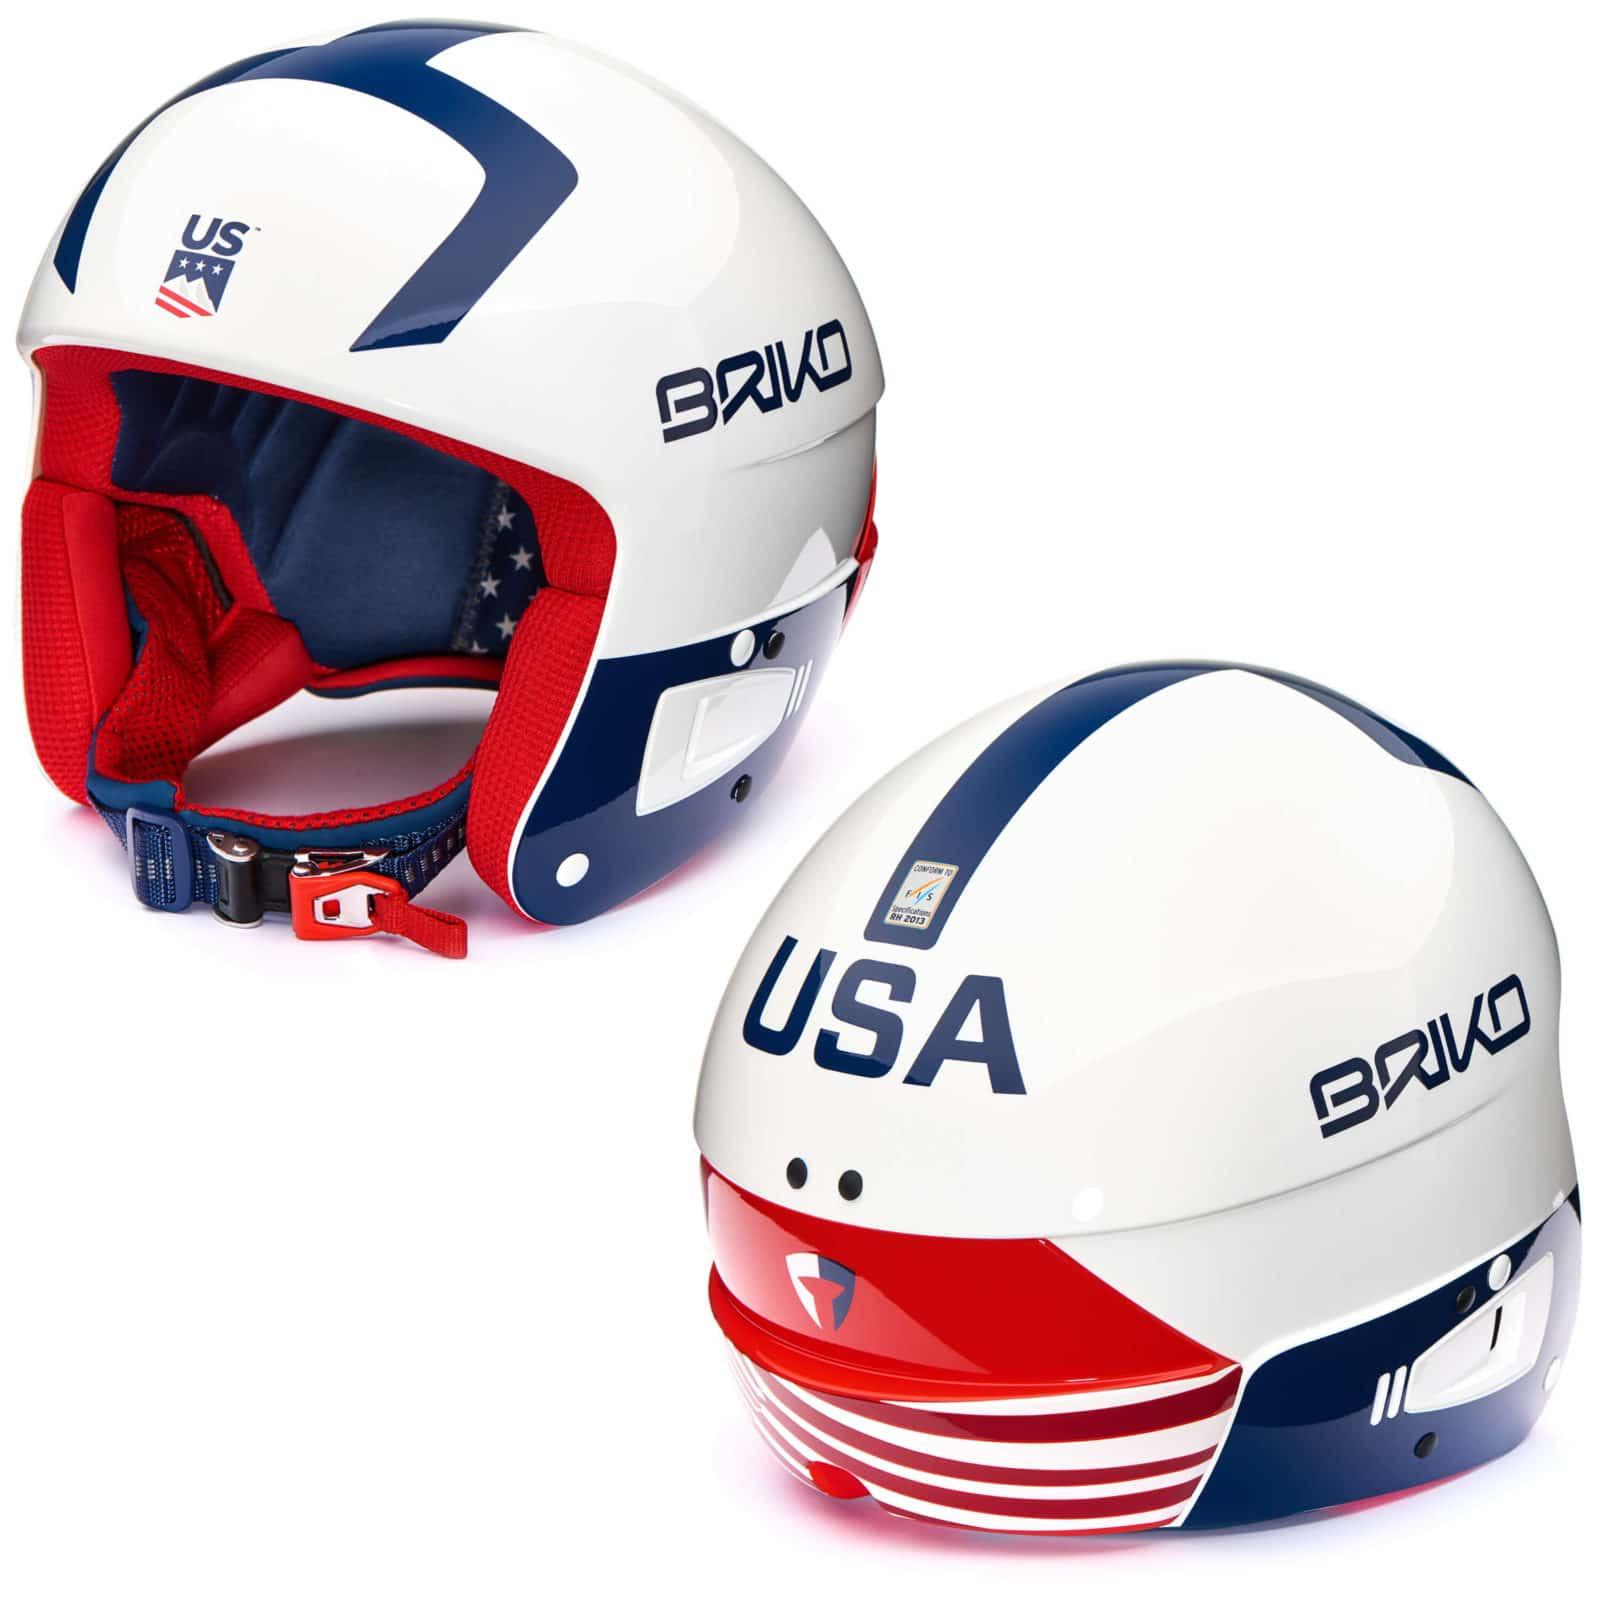 USA Vulcano FIS Helmet